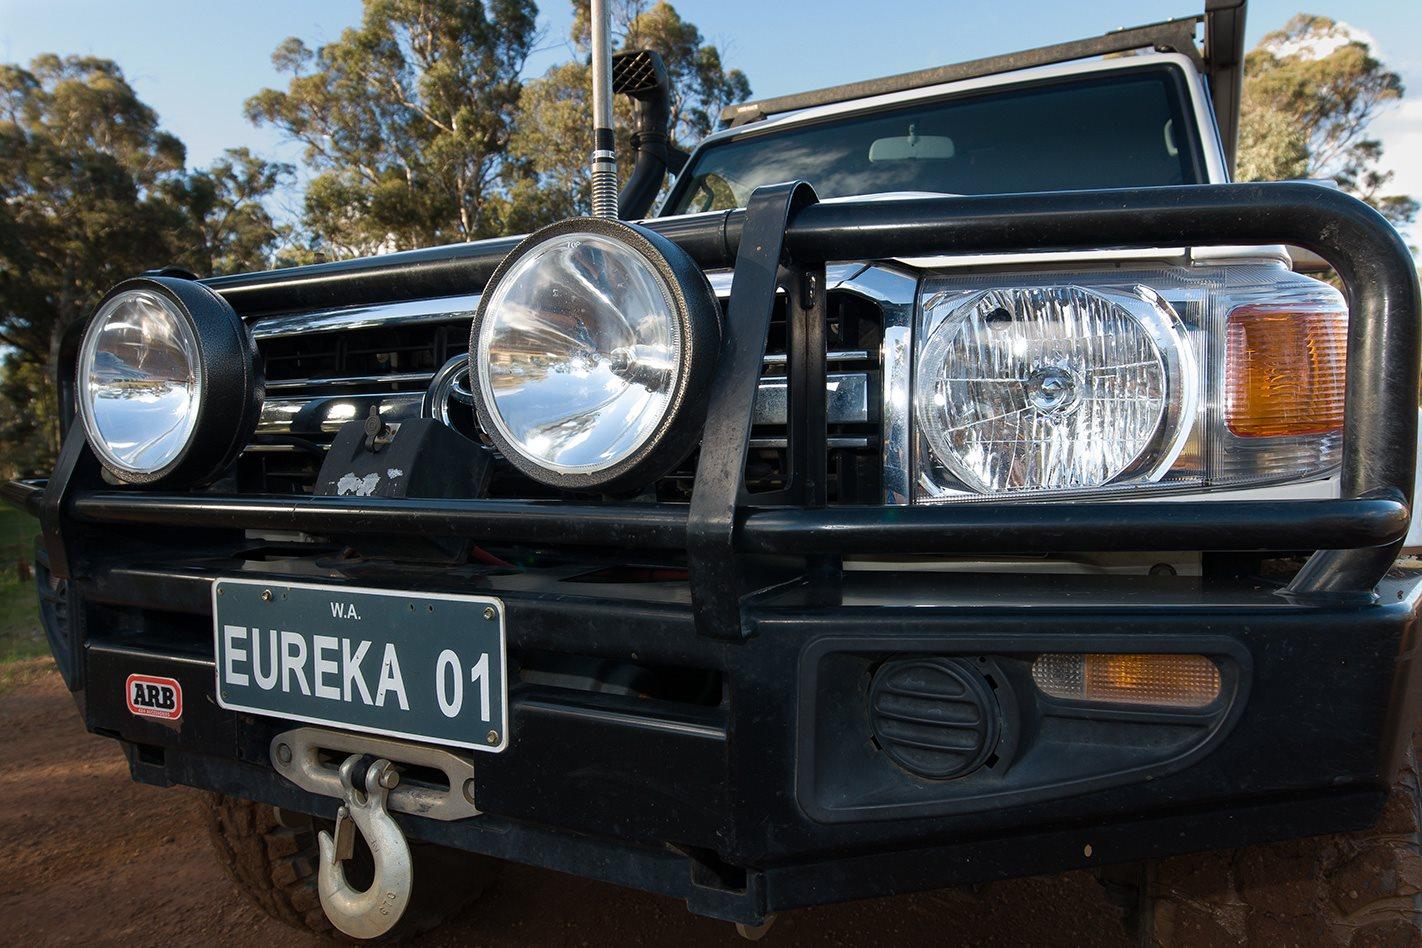 2010-Toyota-Land-Cruiser-76-Series-headlights.jpg